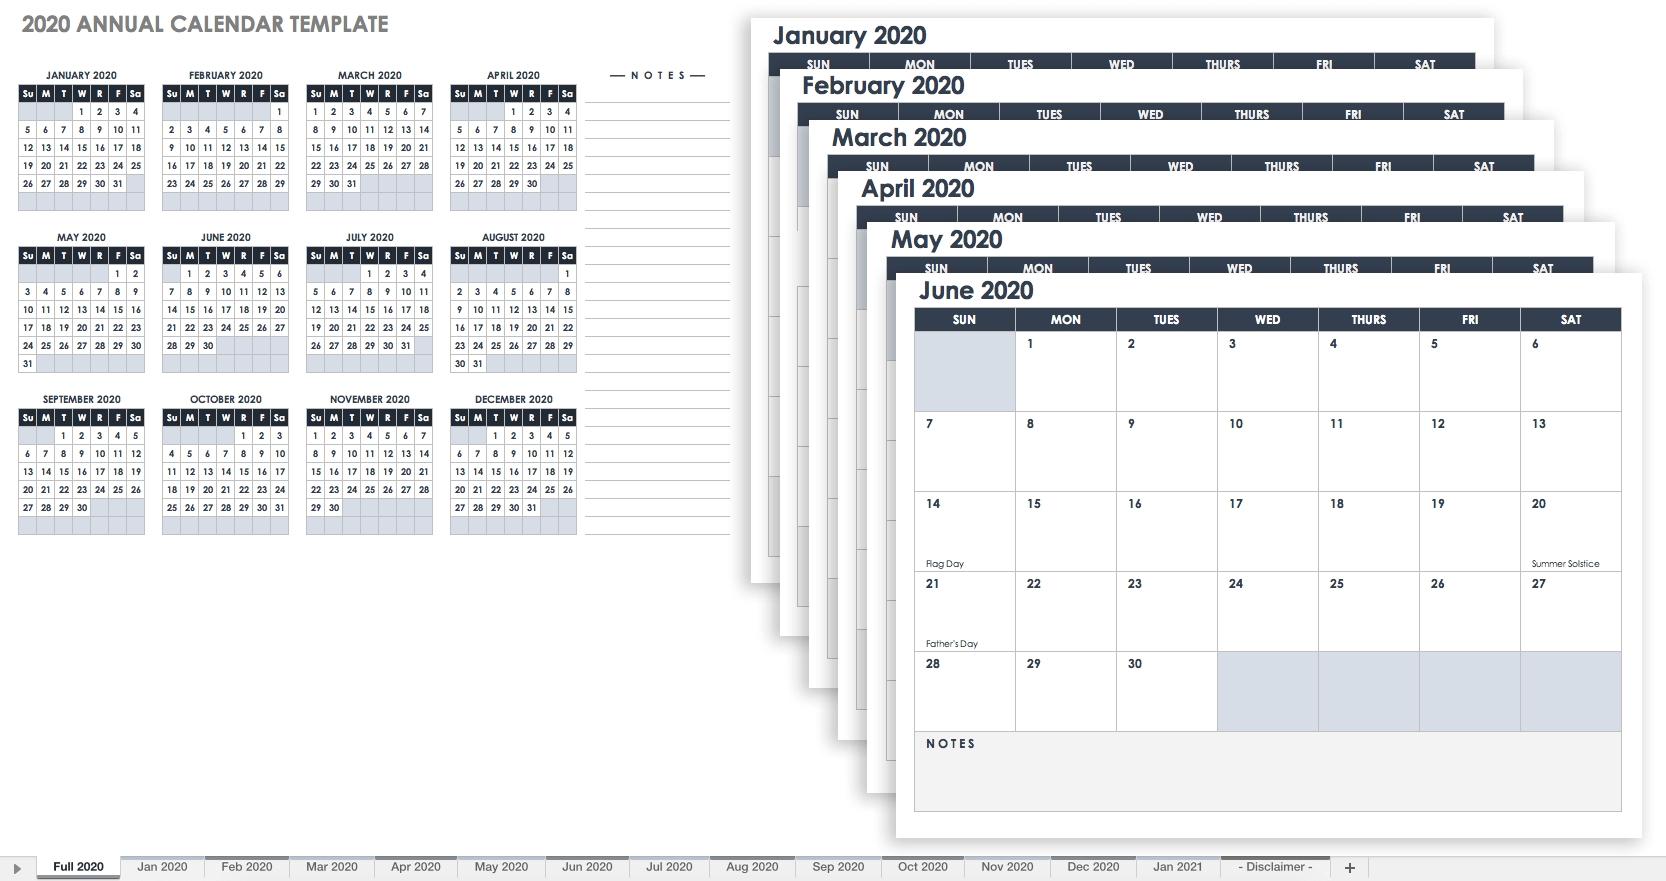 Monthly Printable Calendars 2020 Half Page - Calendar